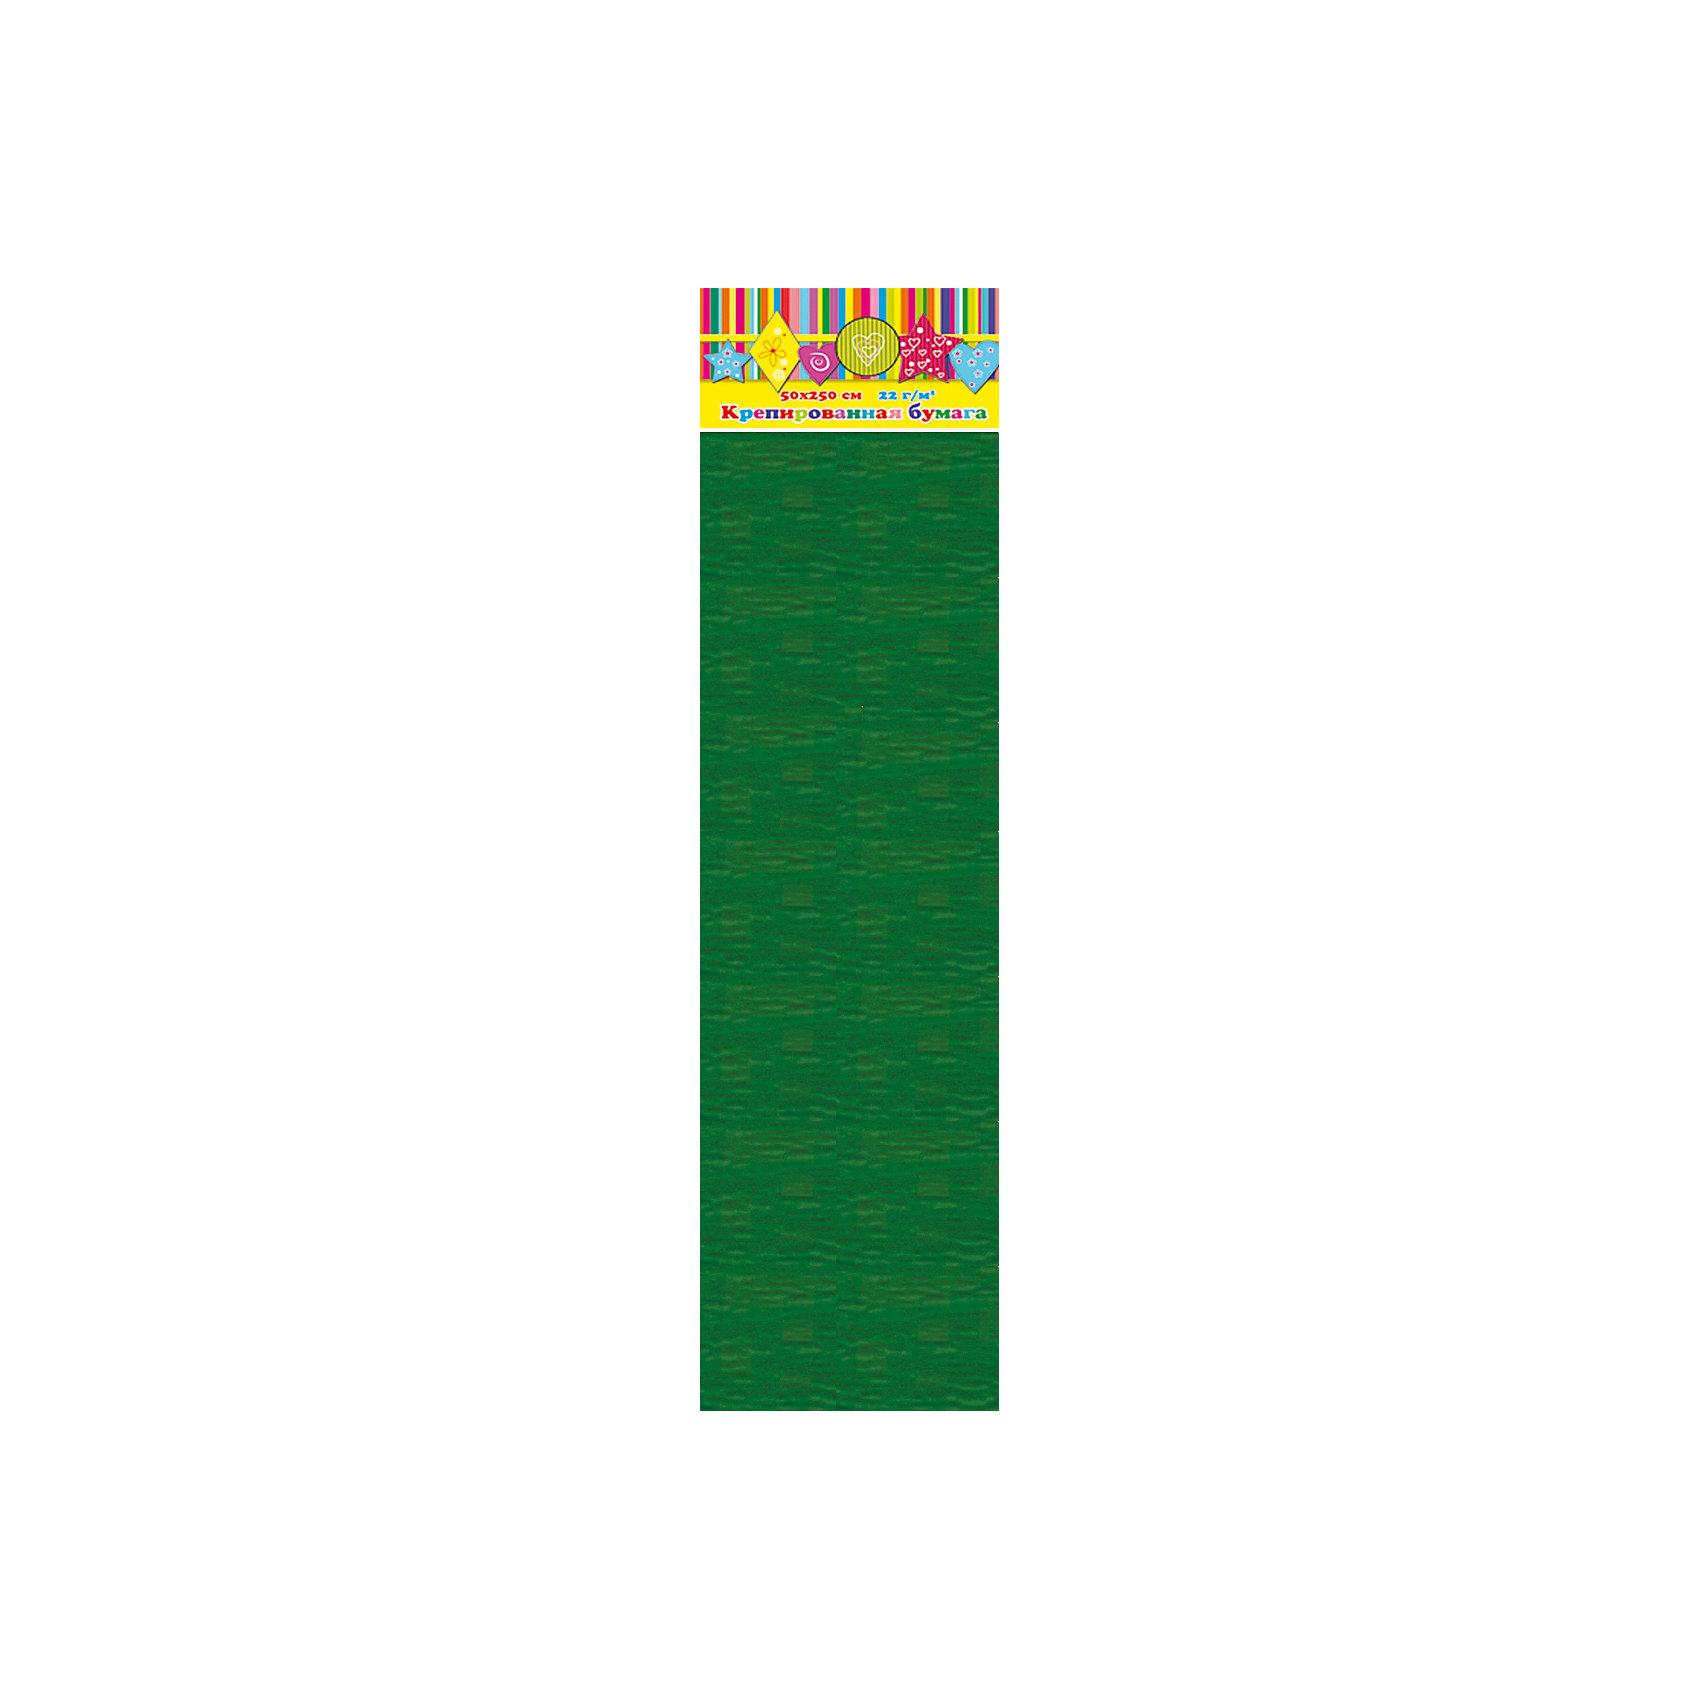 Бумага темно-зеленая крепированная